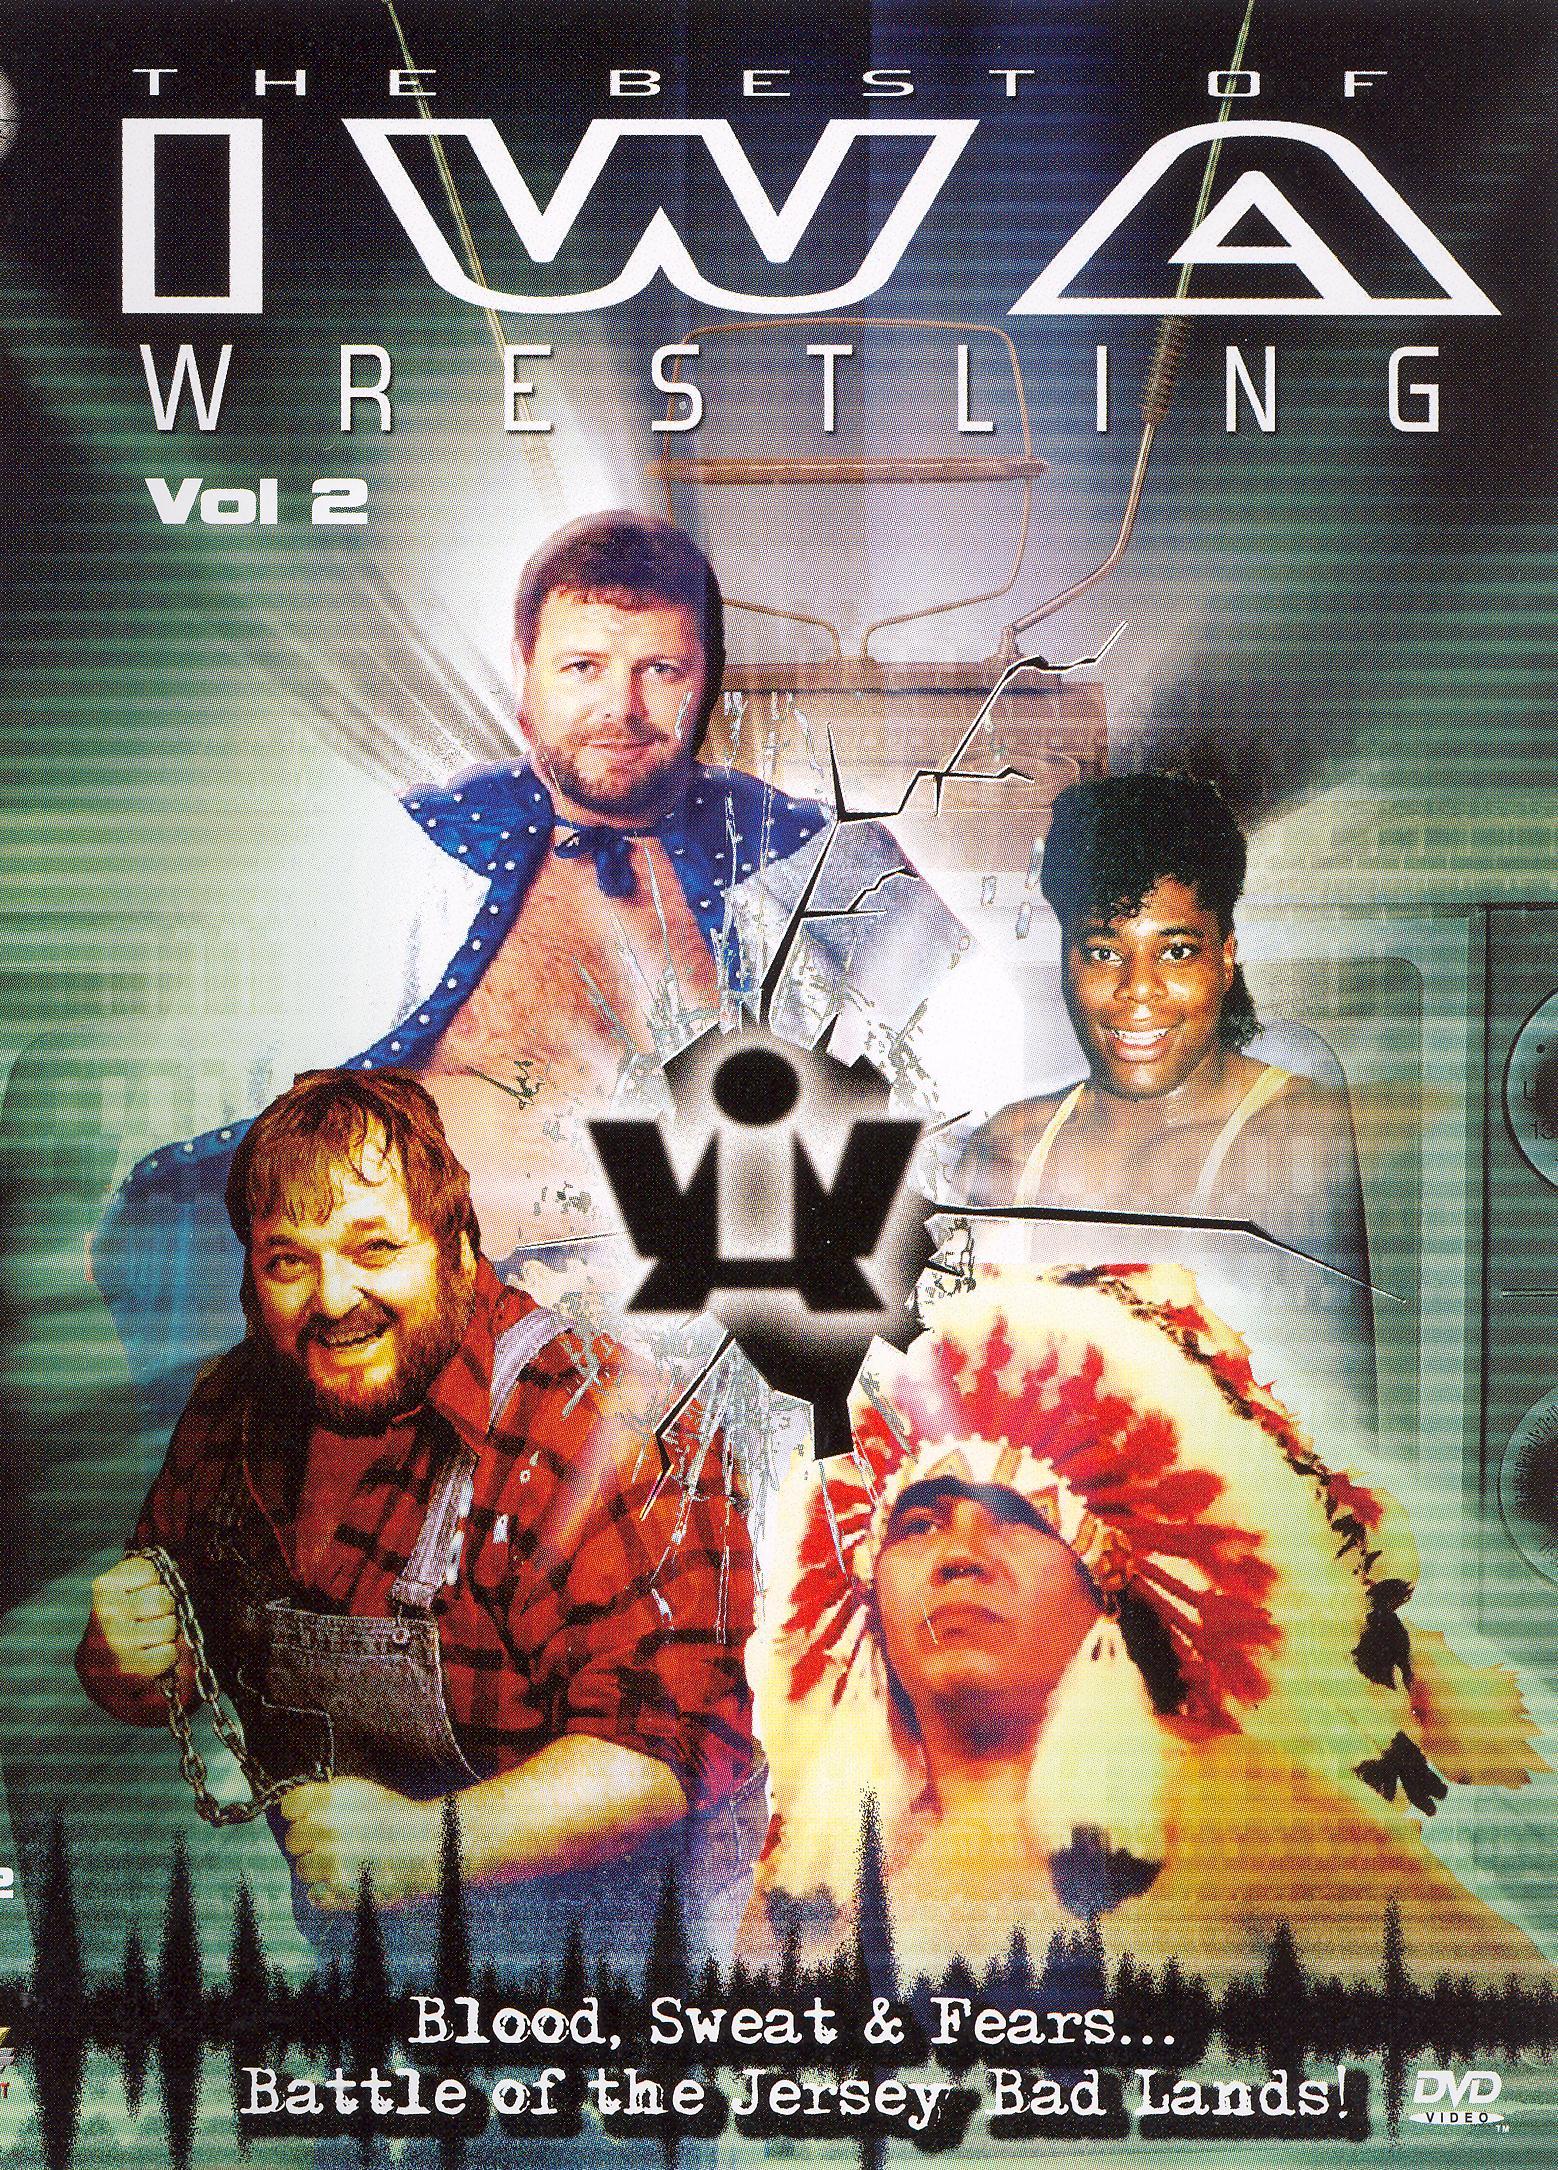 IWA: Championship Wrestling, Vol. 2